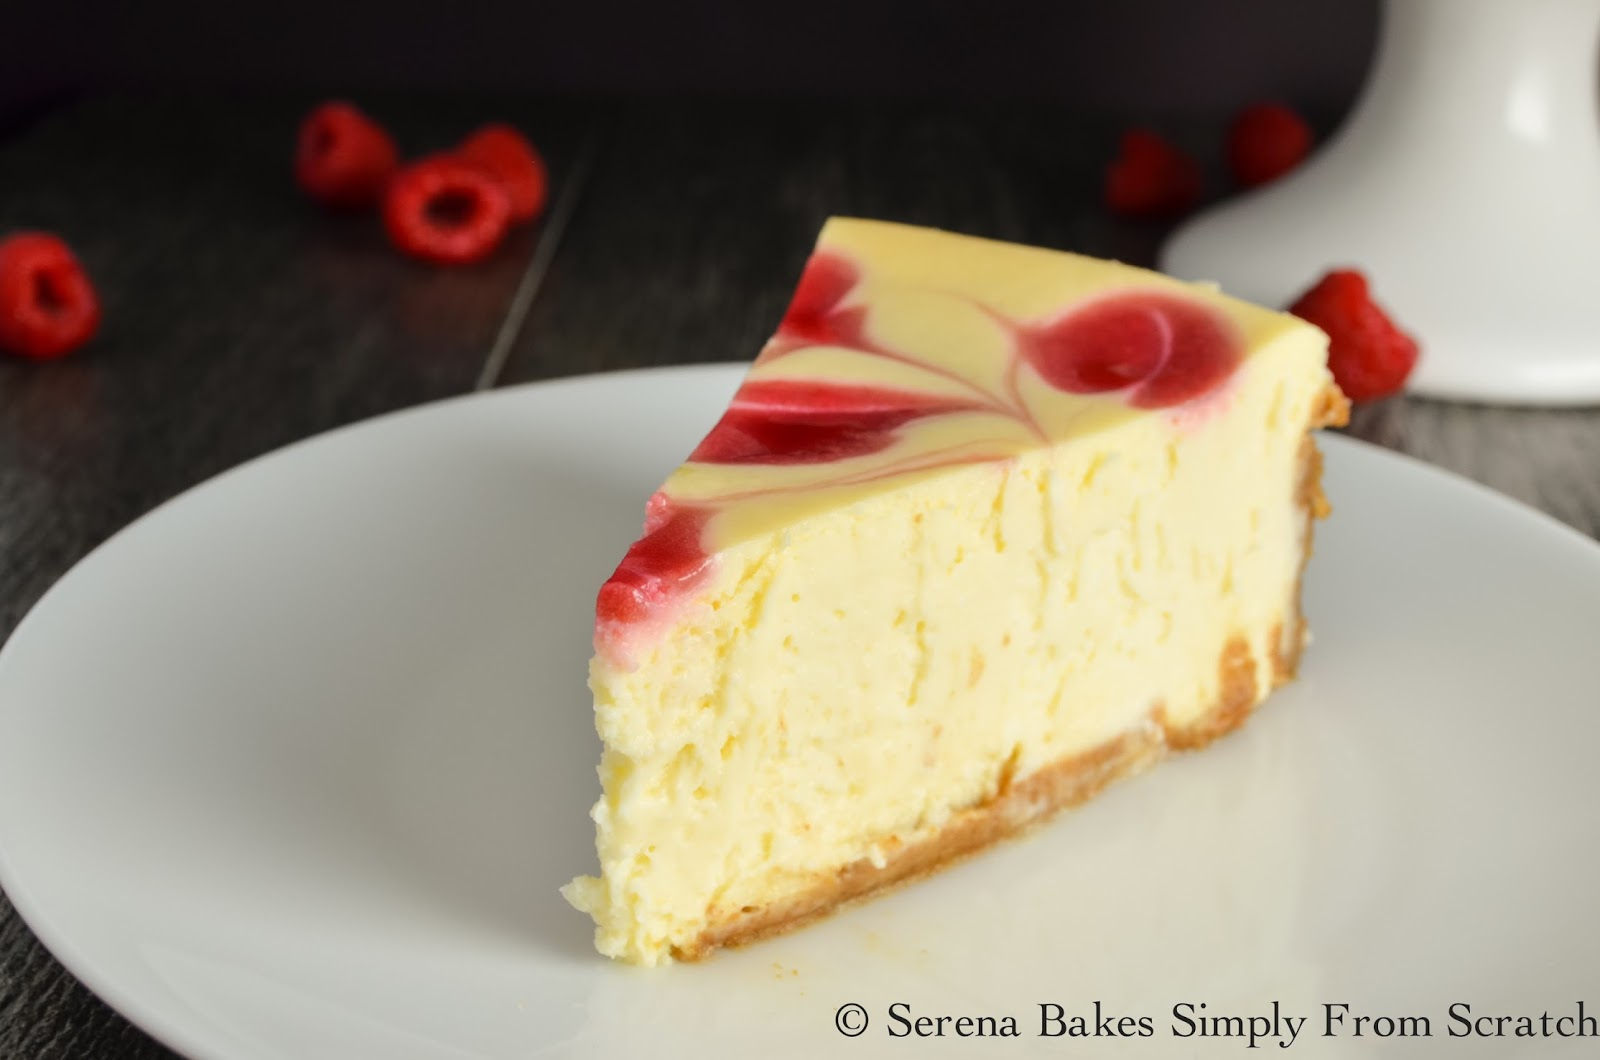 Tall Creamy Cheesecake with Raspberry Swirl.